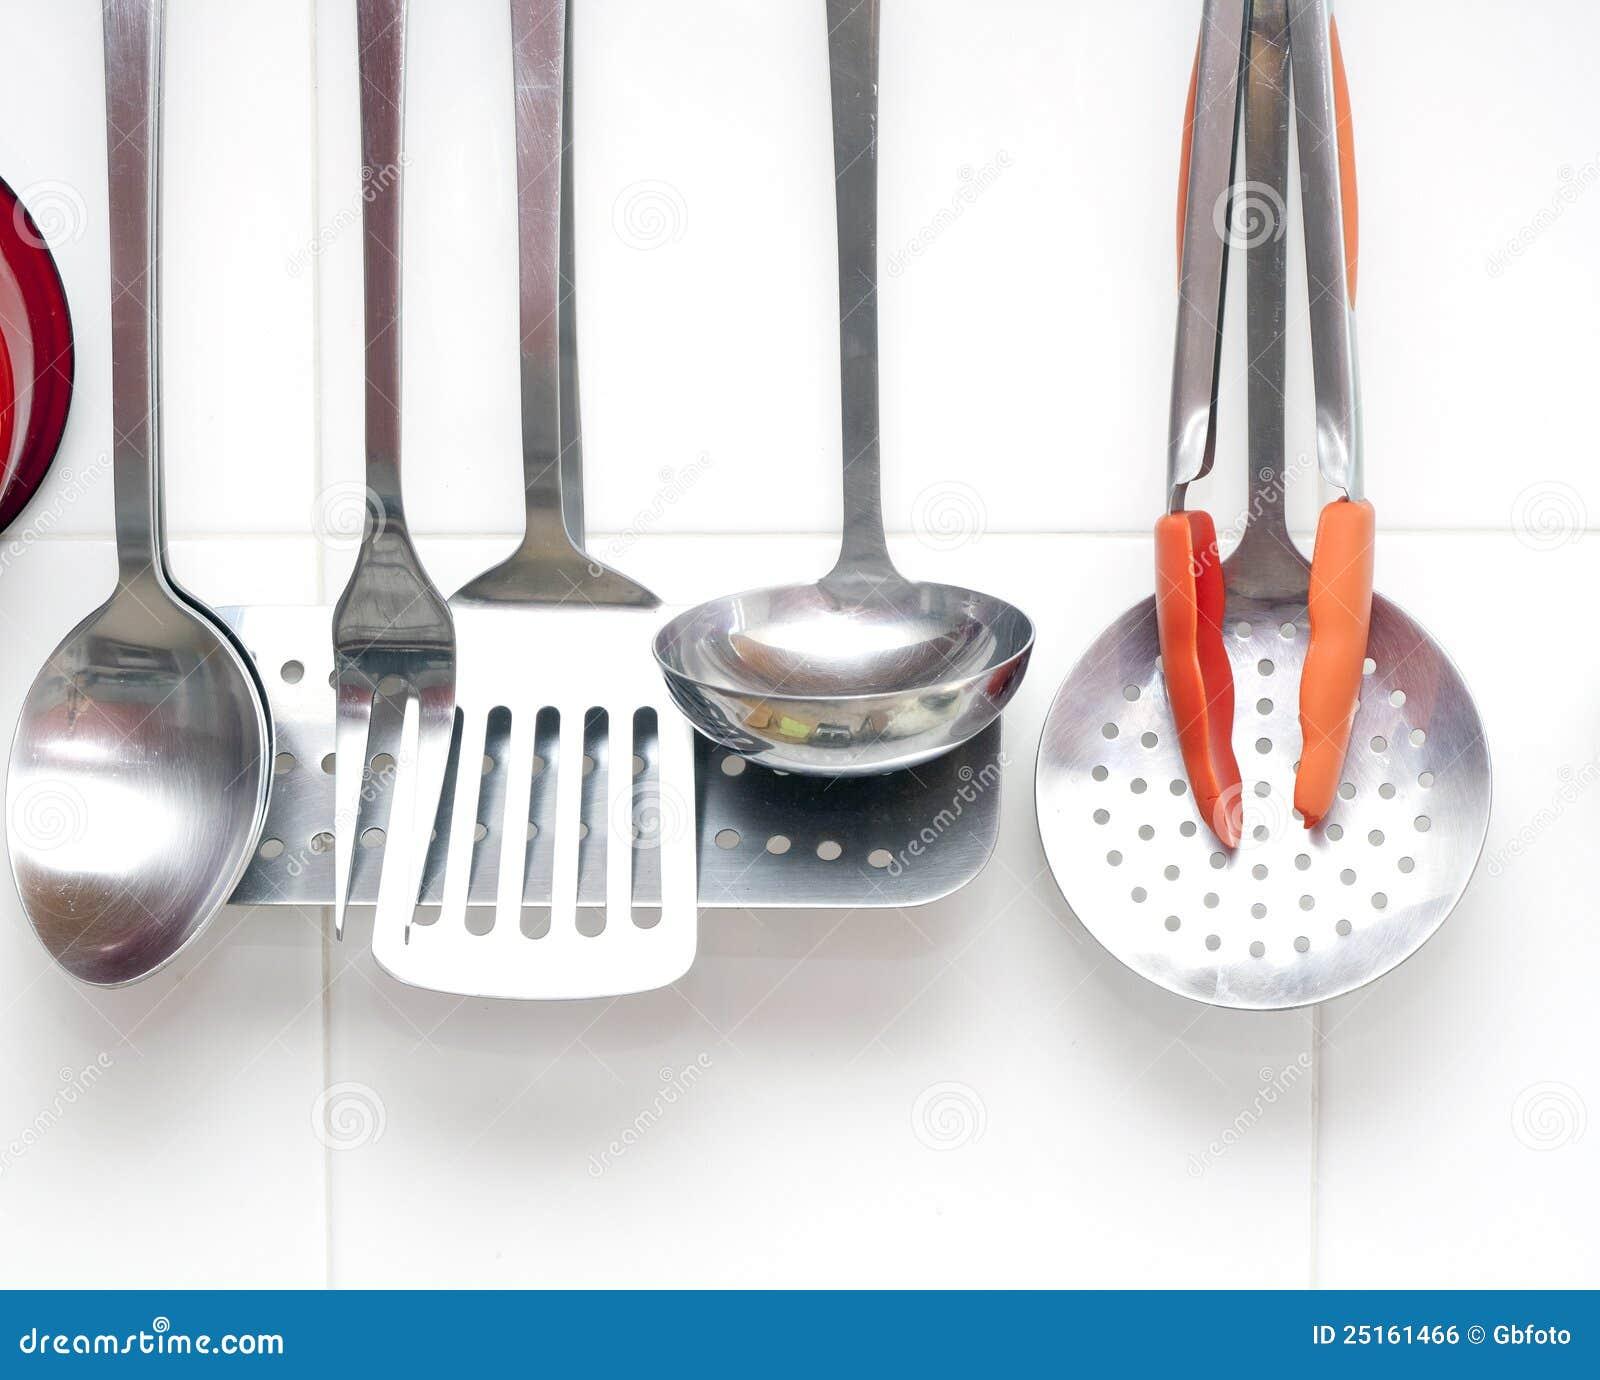 Dream Kitchen Utensils: Kitchen Utensils Royalty Free Stock Image